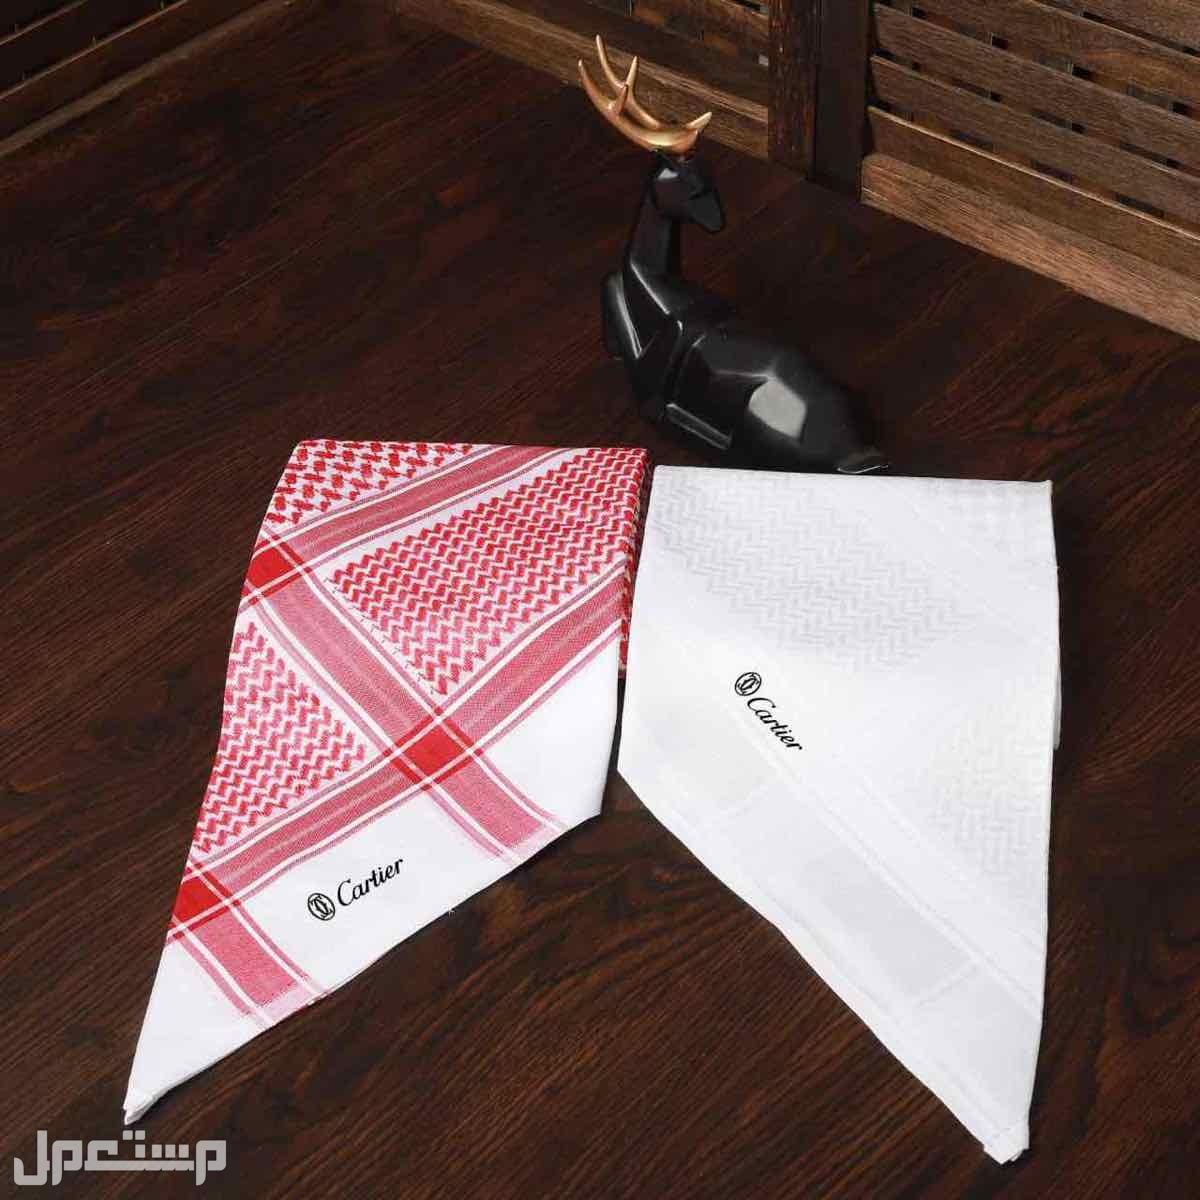 بوكس هدايا رجالي جيفنشي كارتير قماش شماغ قلم كبك شوز صندل نظاره محفظه عطر